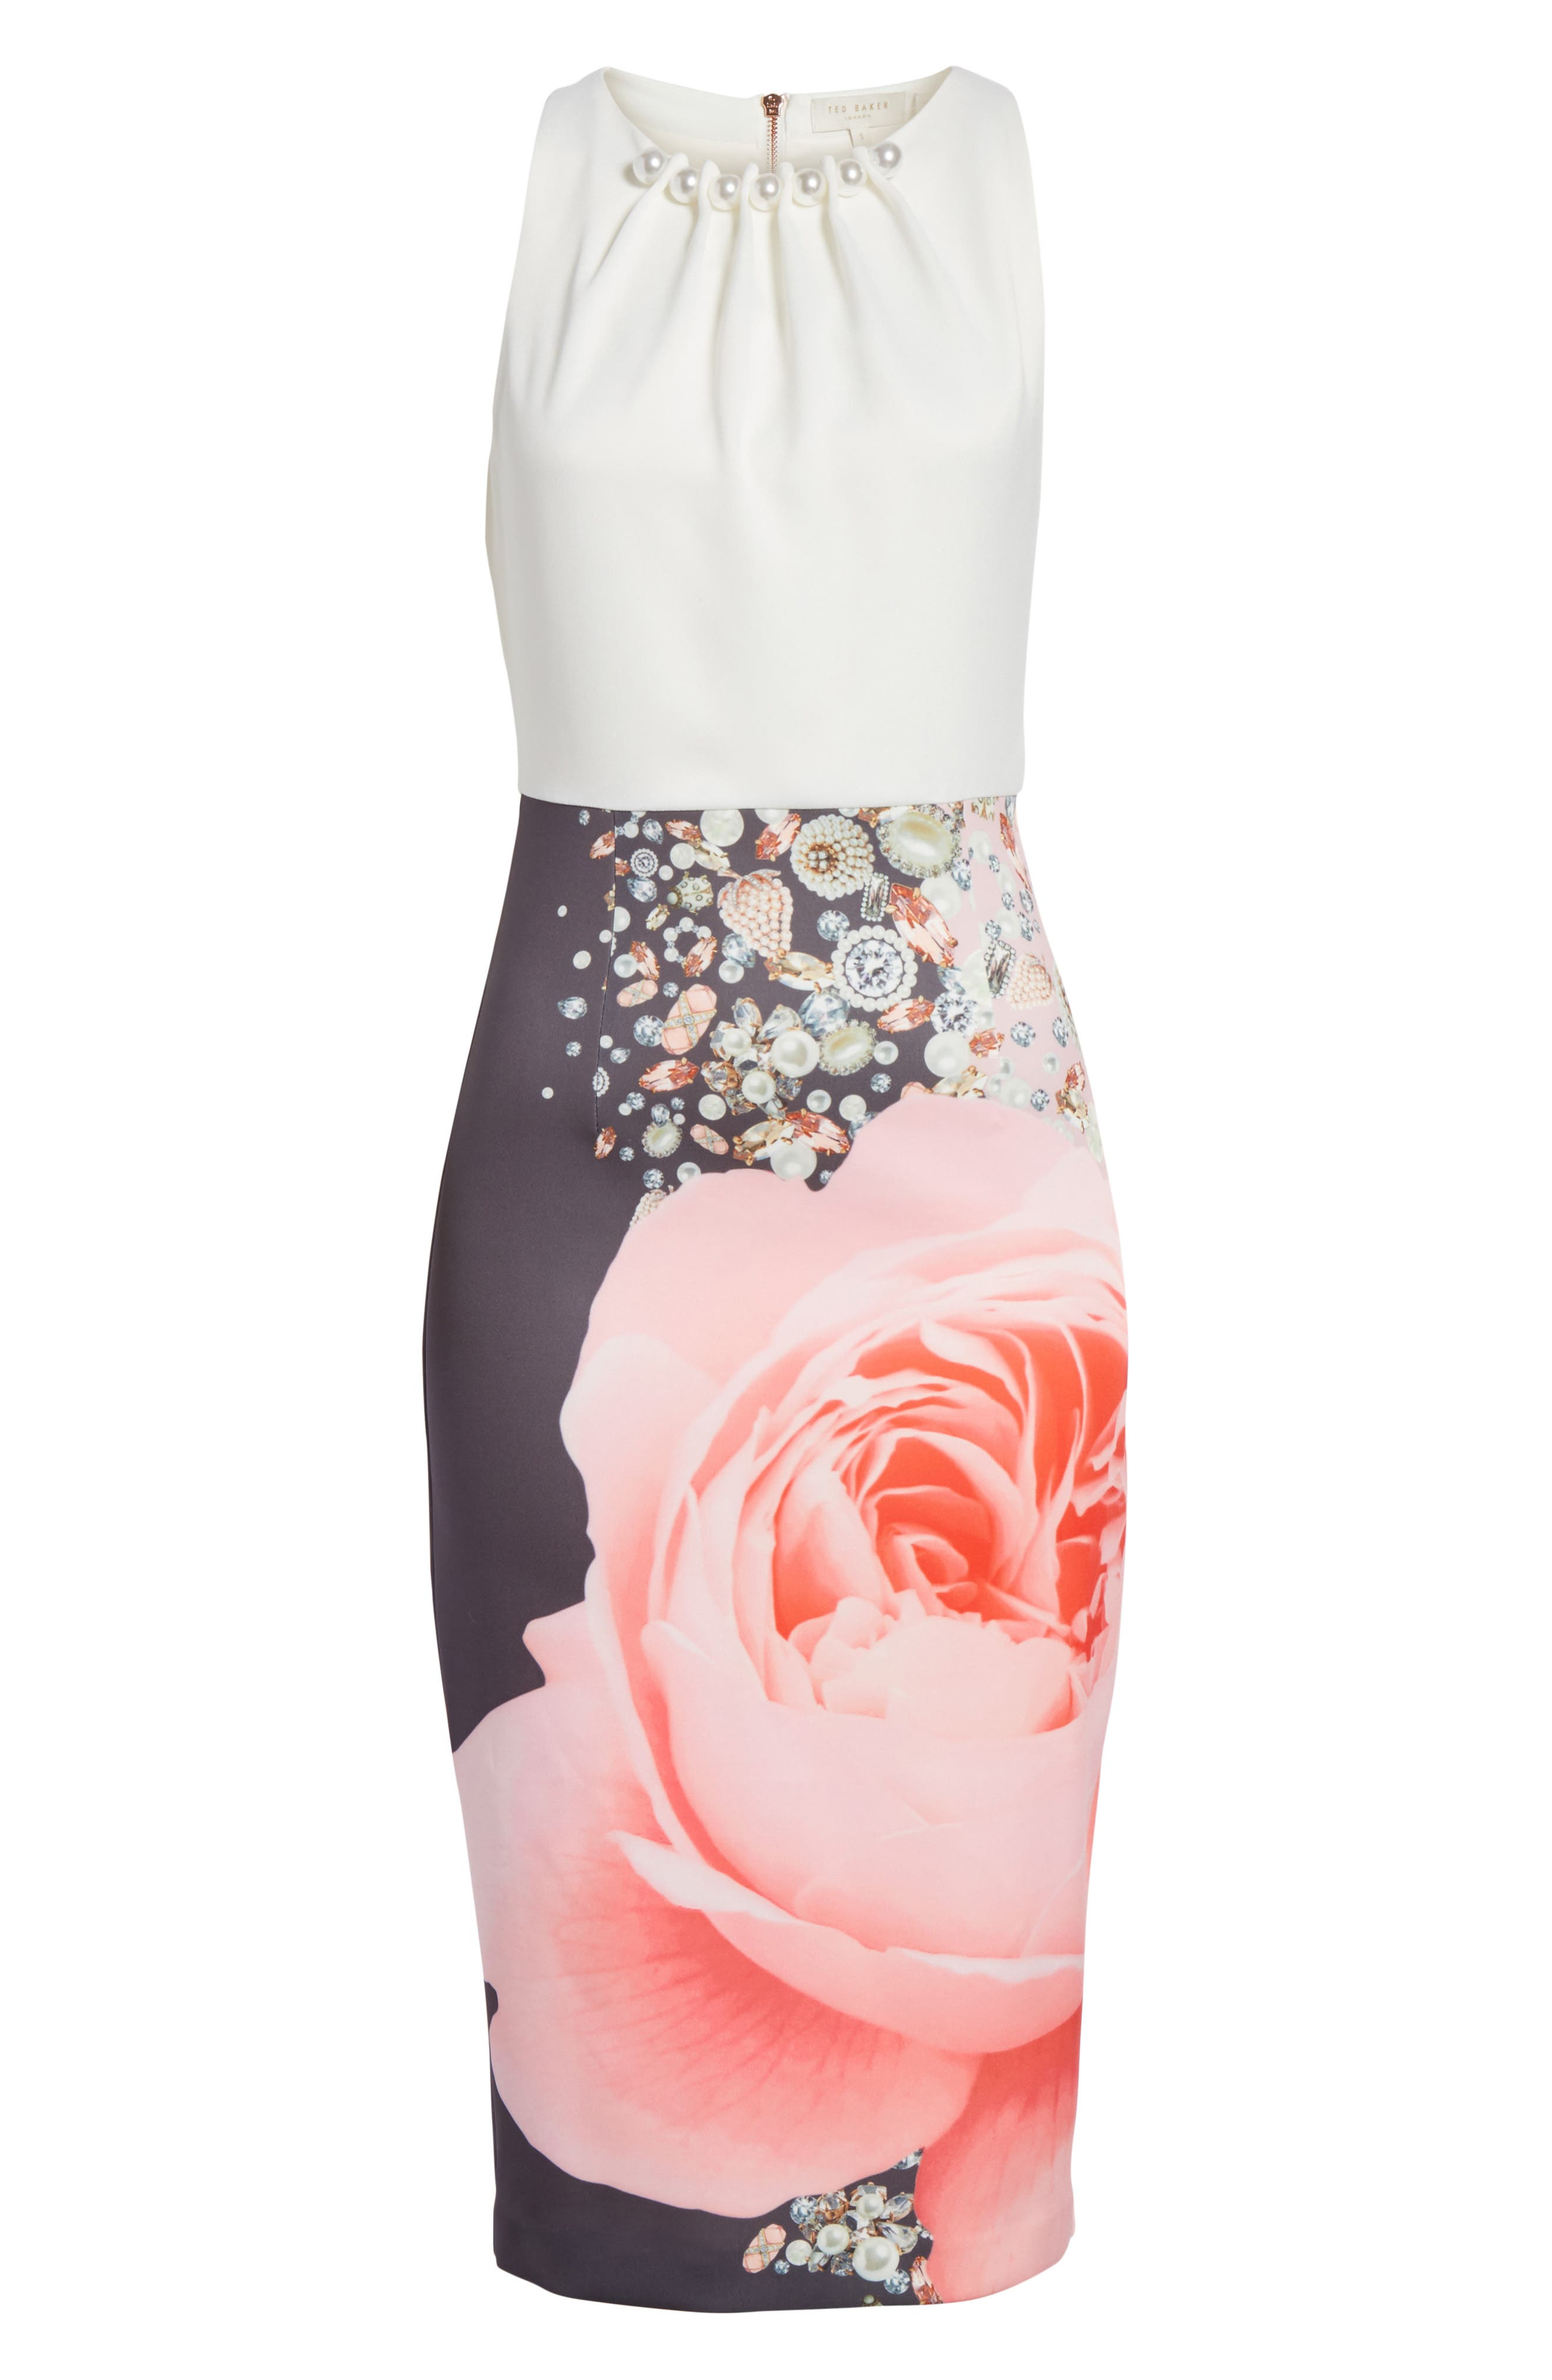 TED BAKER LONDON,                             Blenheim Palace Embellished Body-Con Dress,                             Alternate thumbnail 6, color,                             253